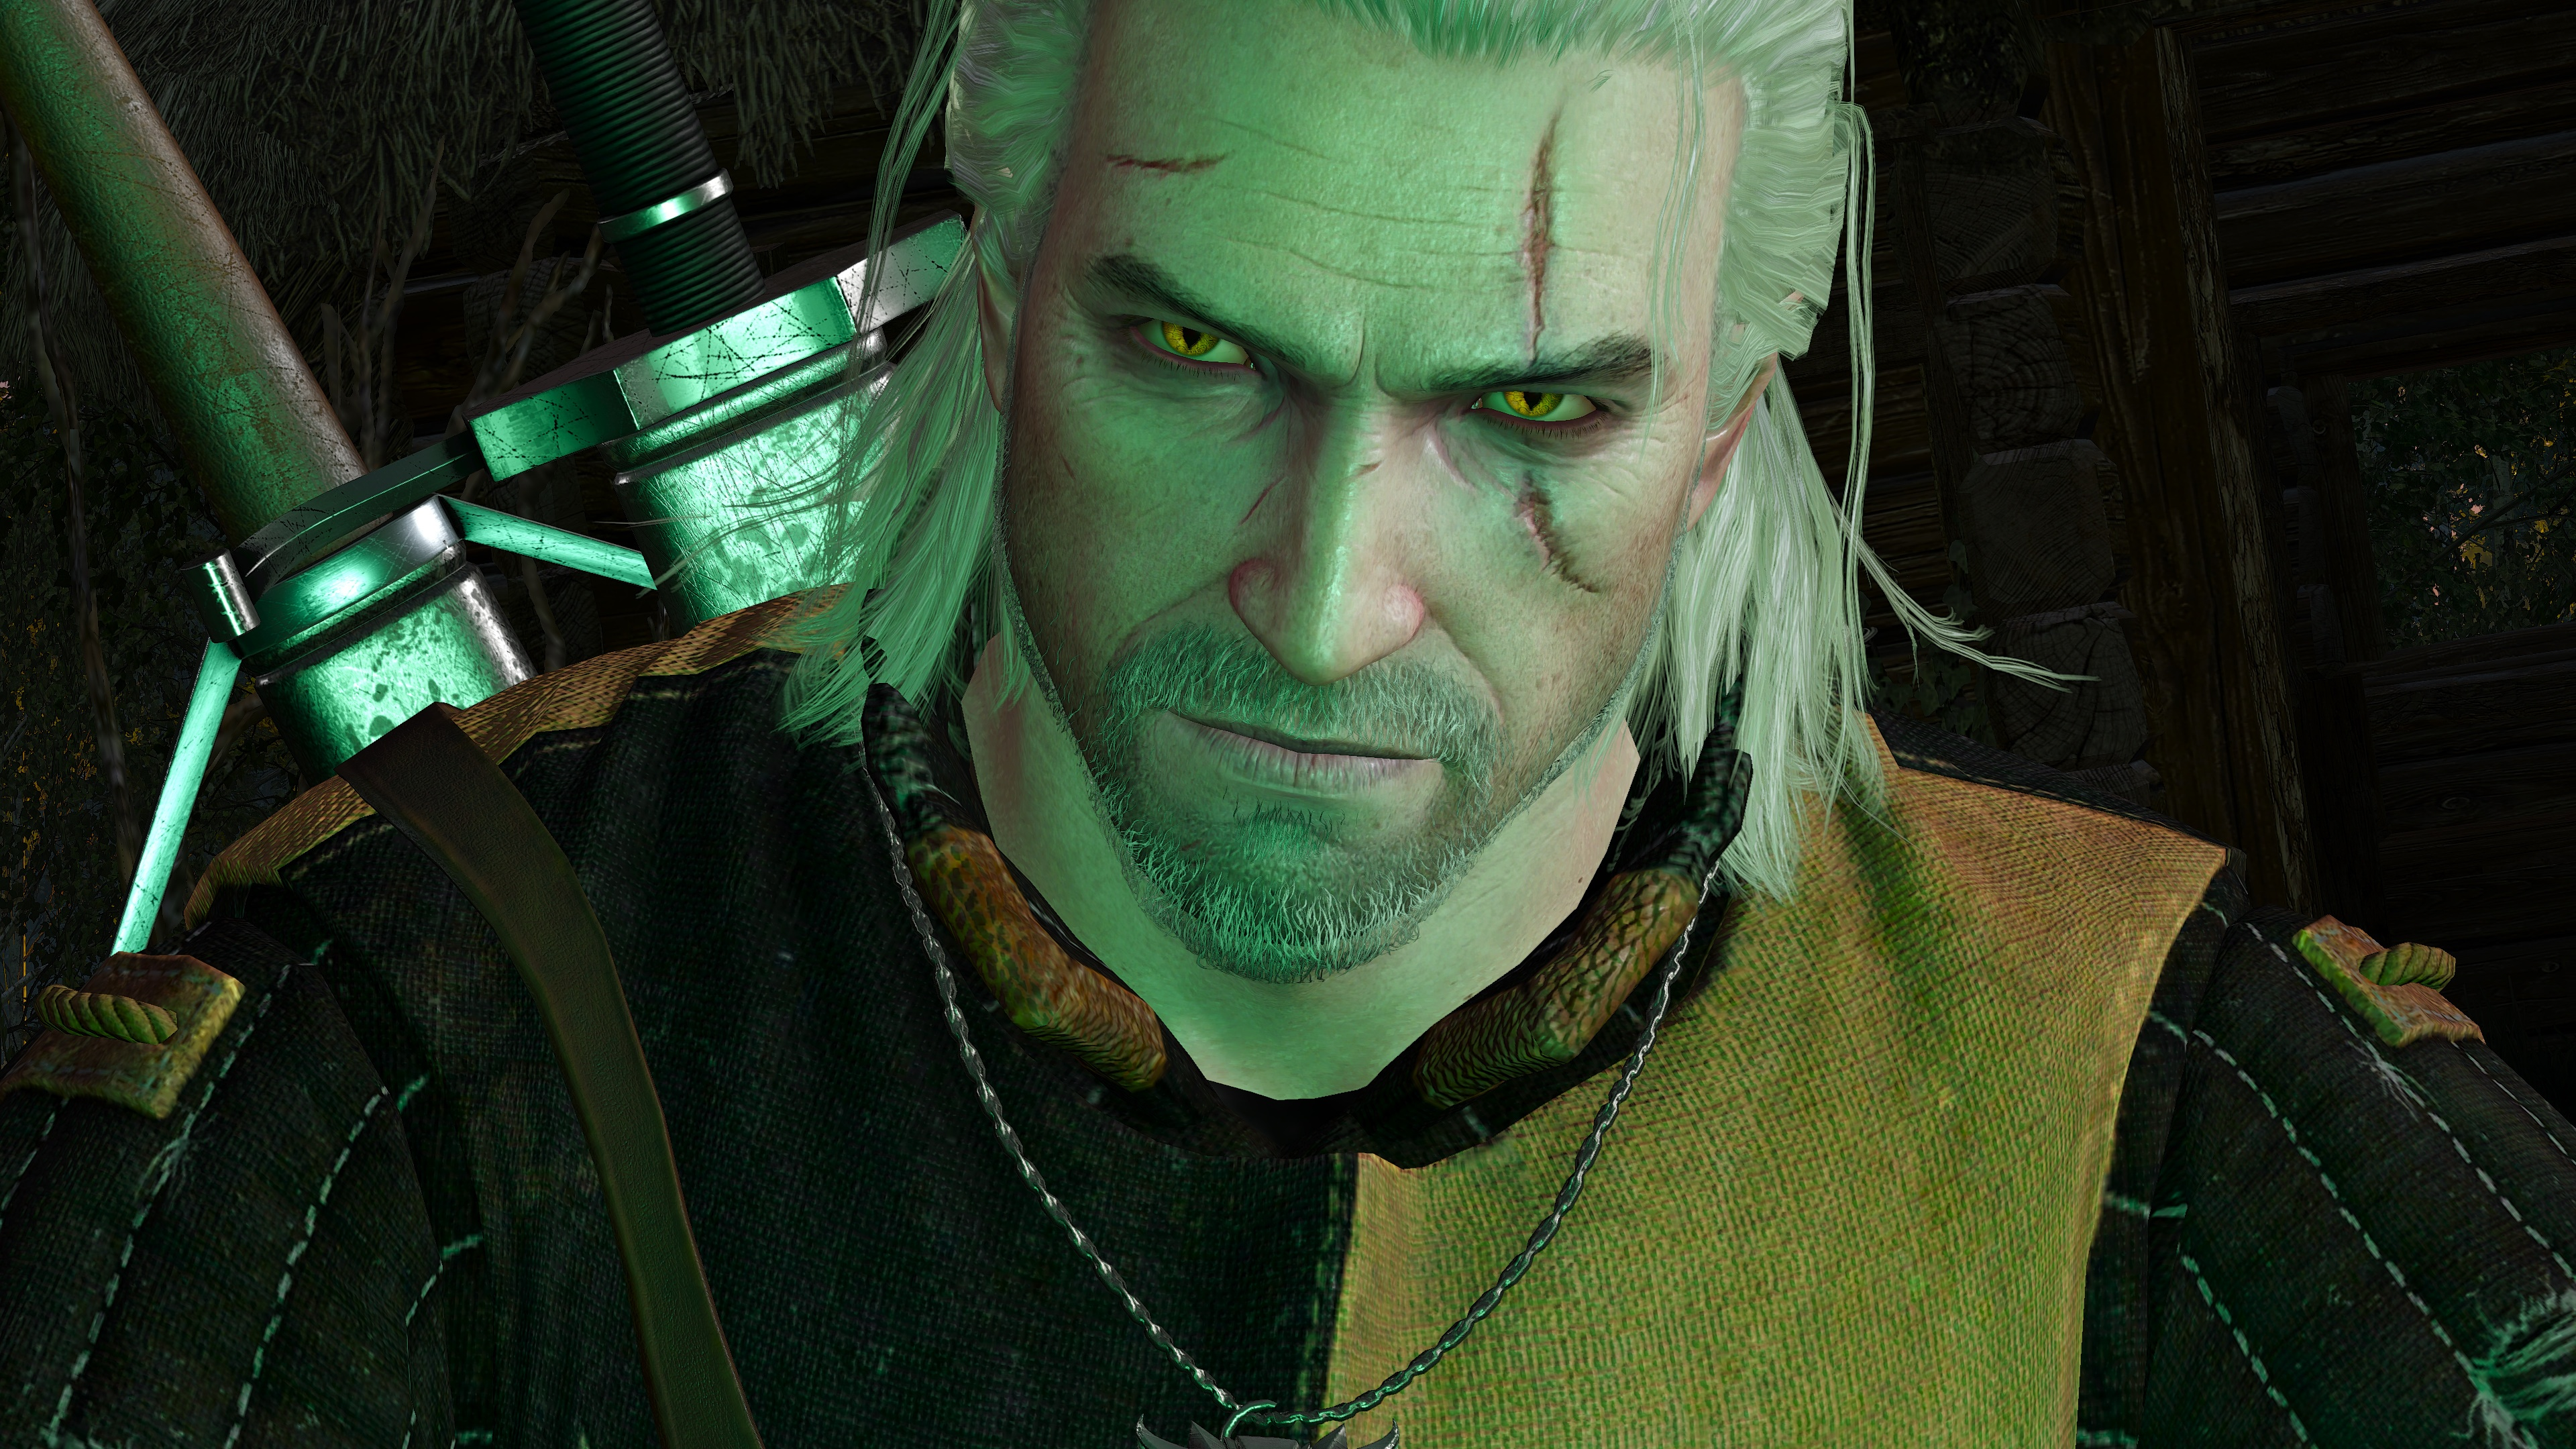 The Witcher 3 Screenshot 2020.07.17- 20.49.15.08.jpg - The Witcher 3: Wild Hunt